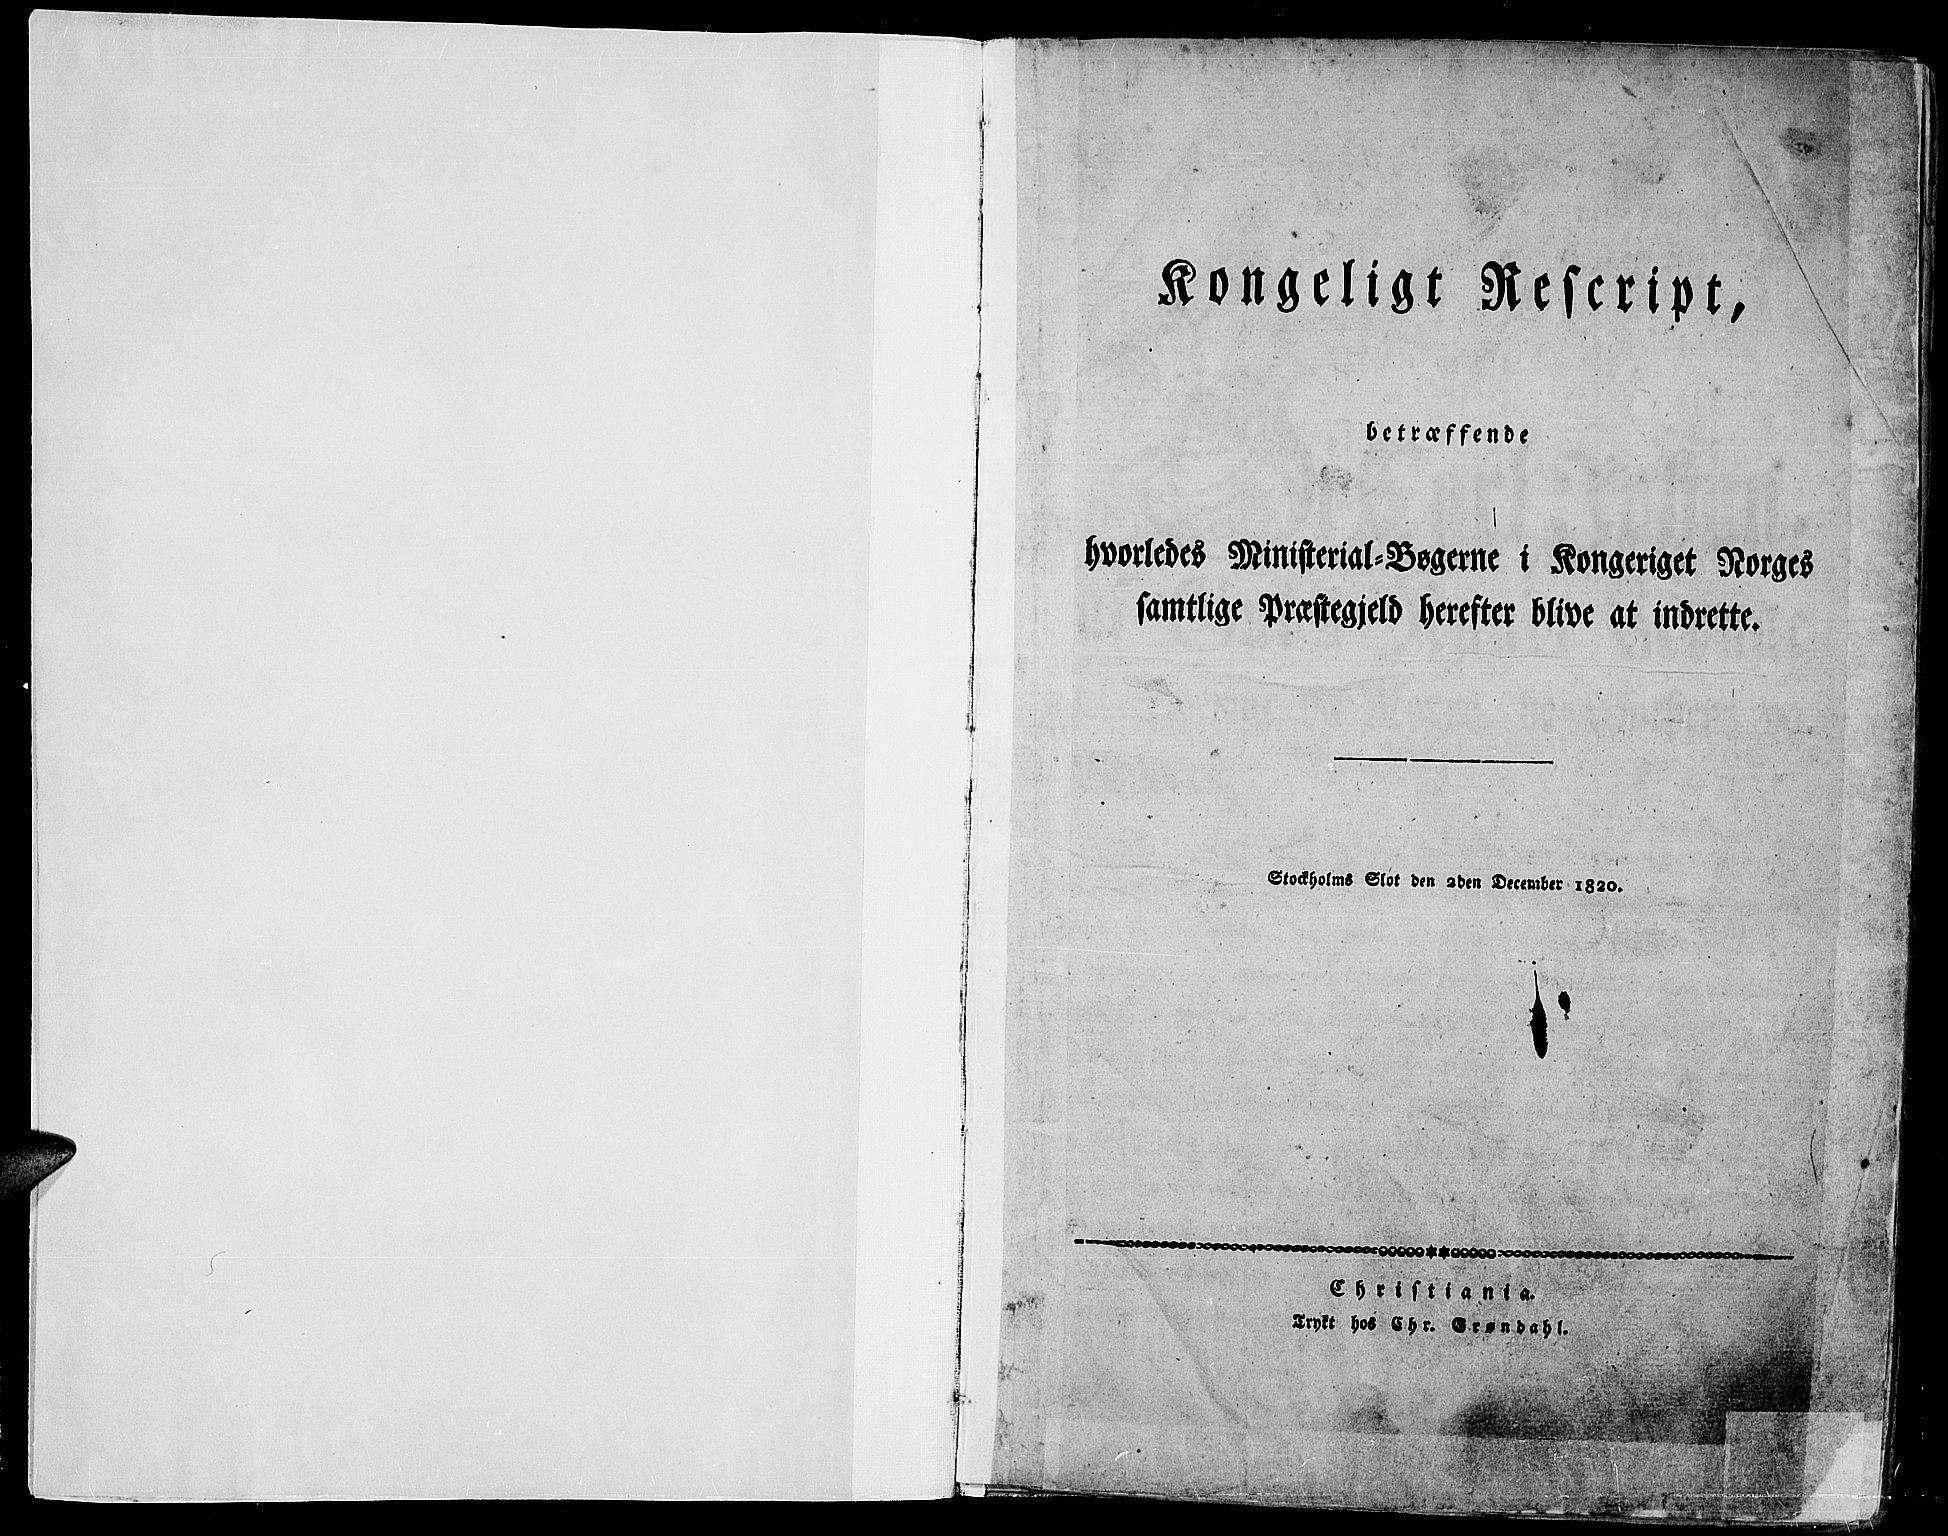 SAH, Nord-Aurdal prestekontor, Ministerialbok nr. 3, 1828-1841